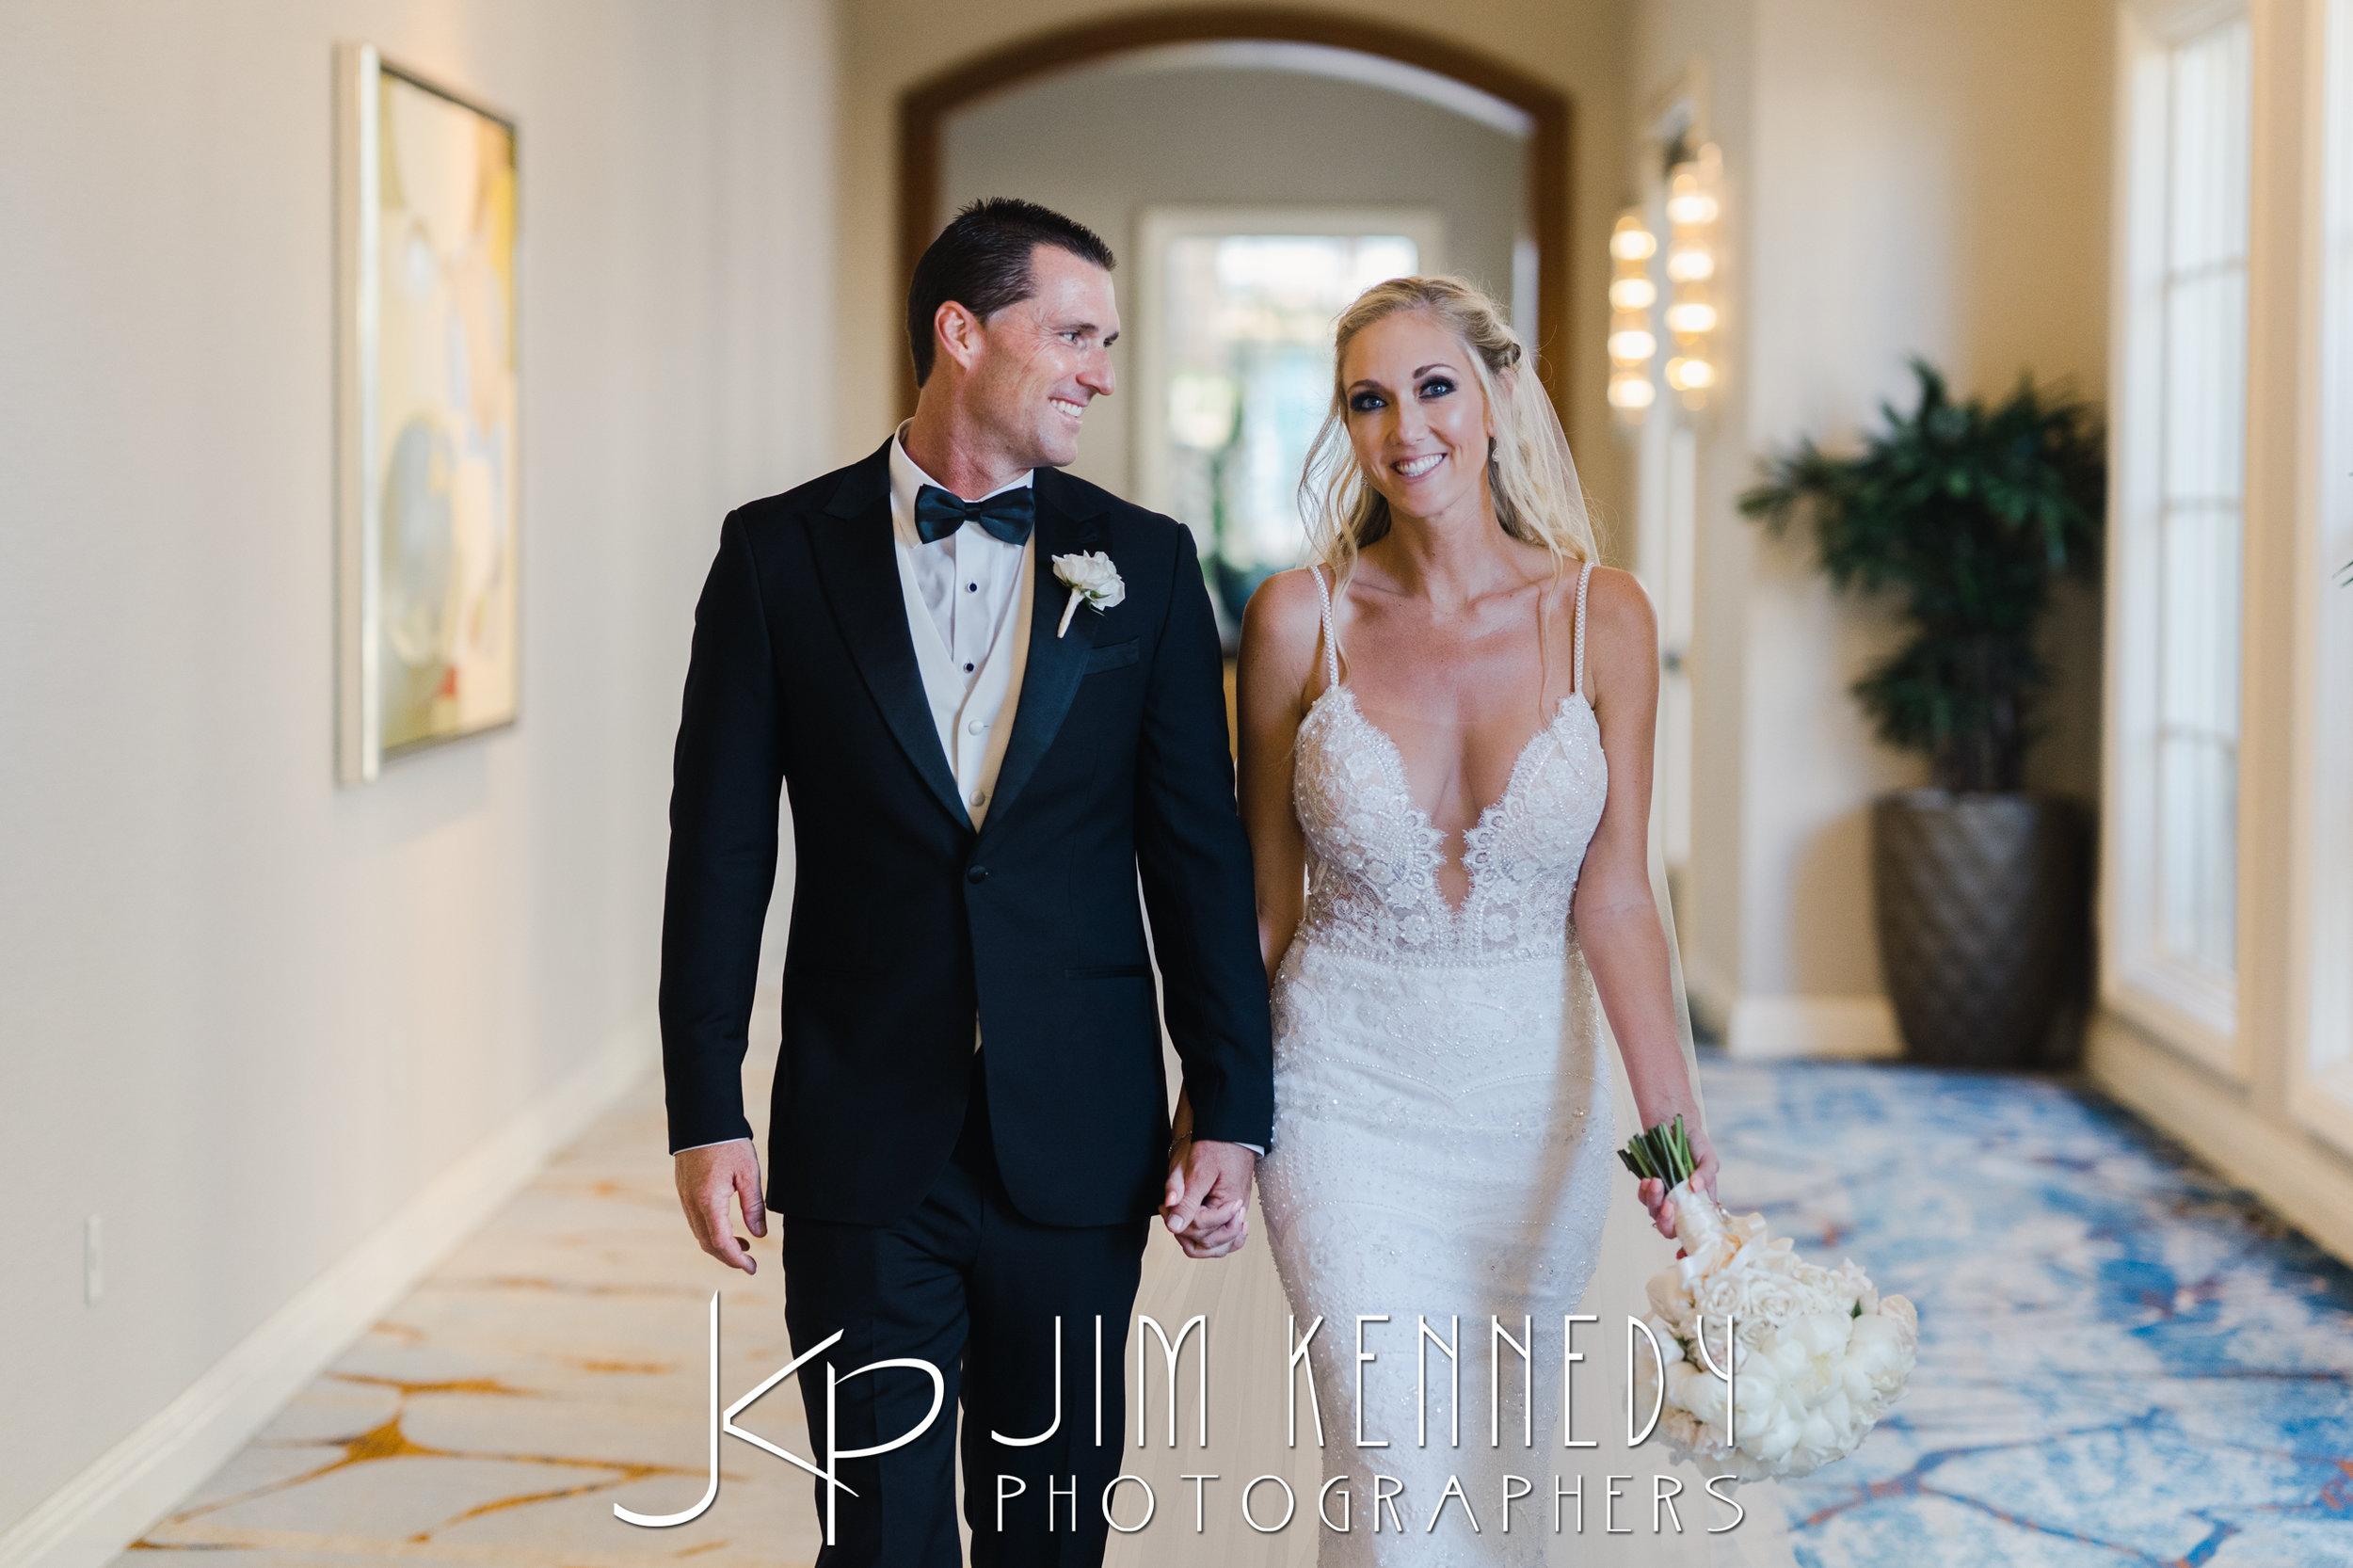 balboa-bay-resort-wedding-brooke-kevin_0148.JPG